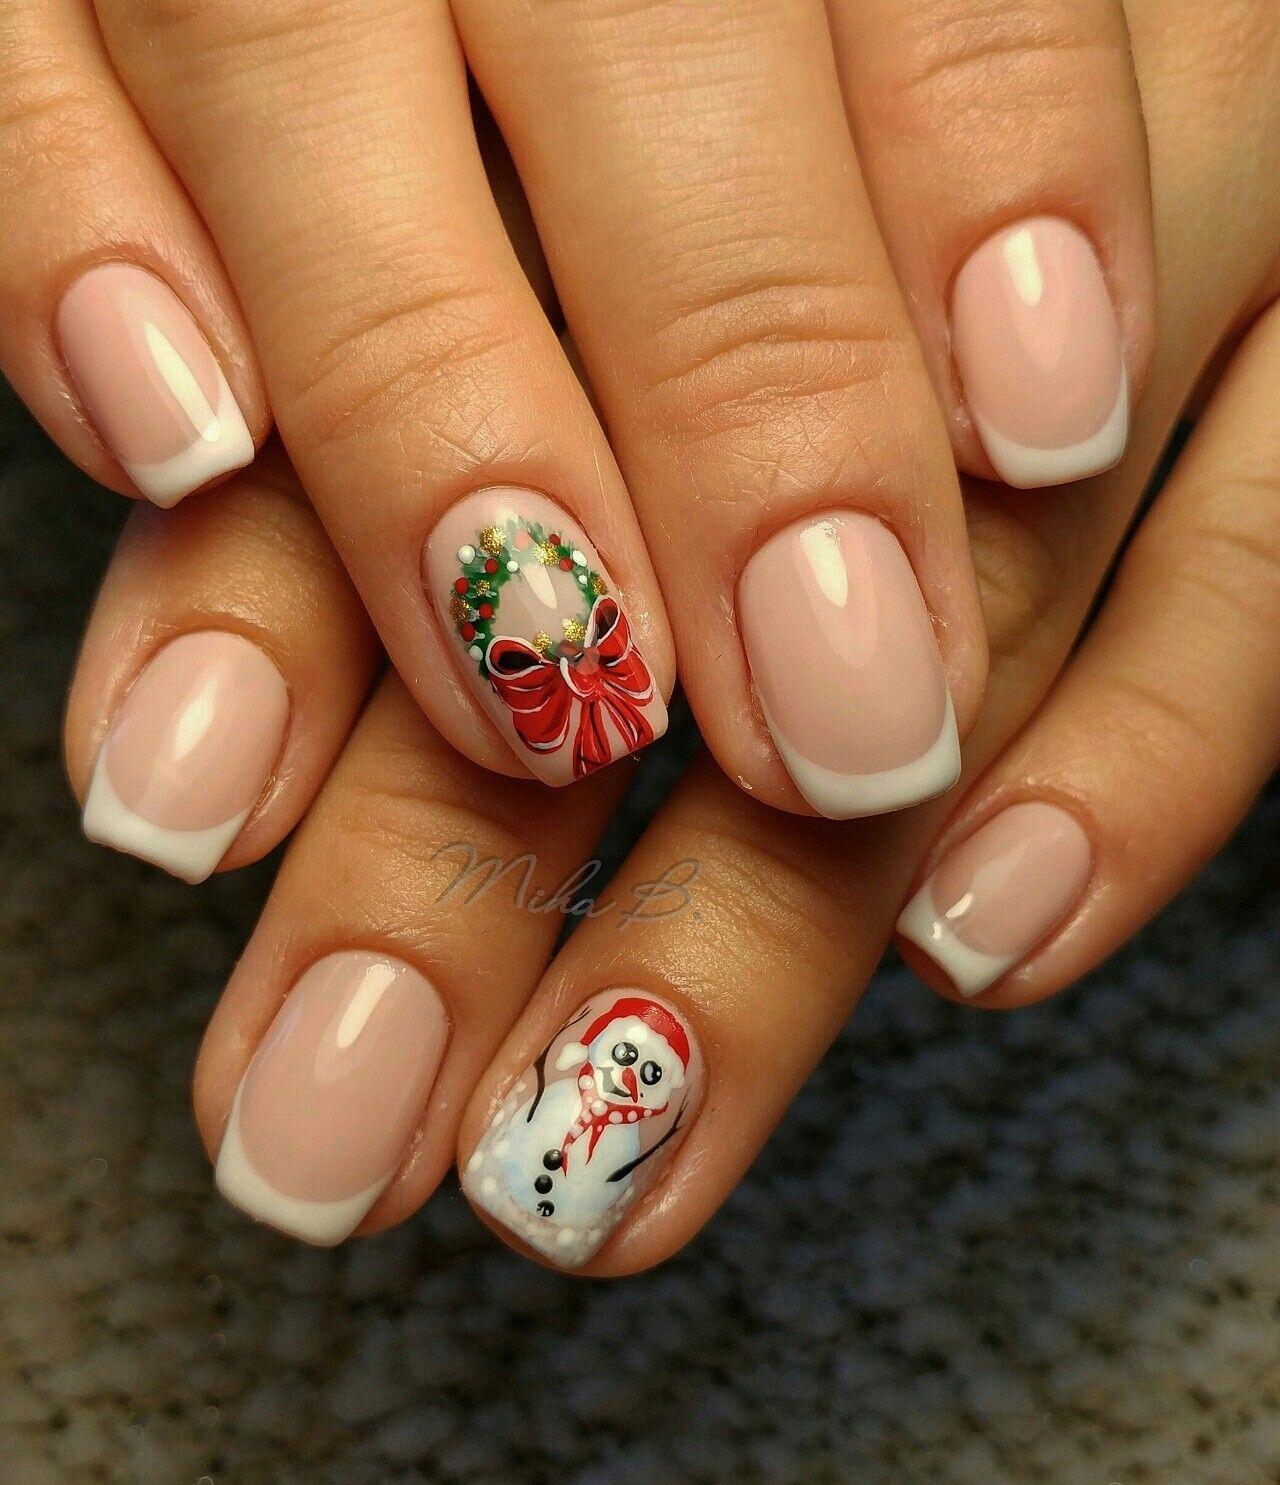 French manicure,Christmas nails, christmas nails, snowman | Nail art ...